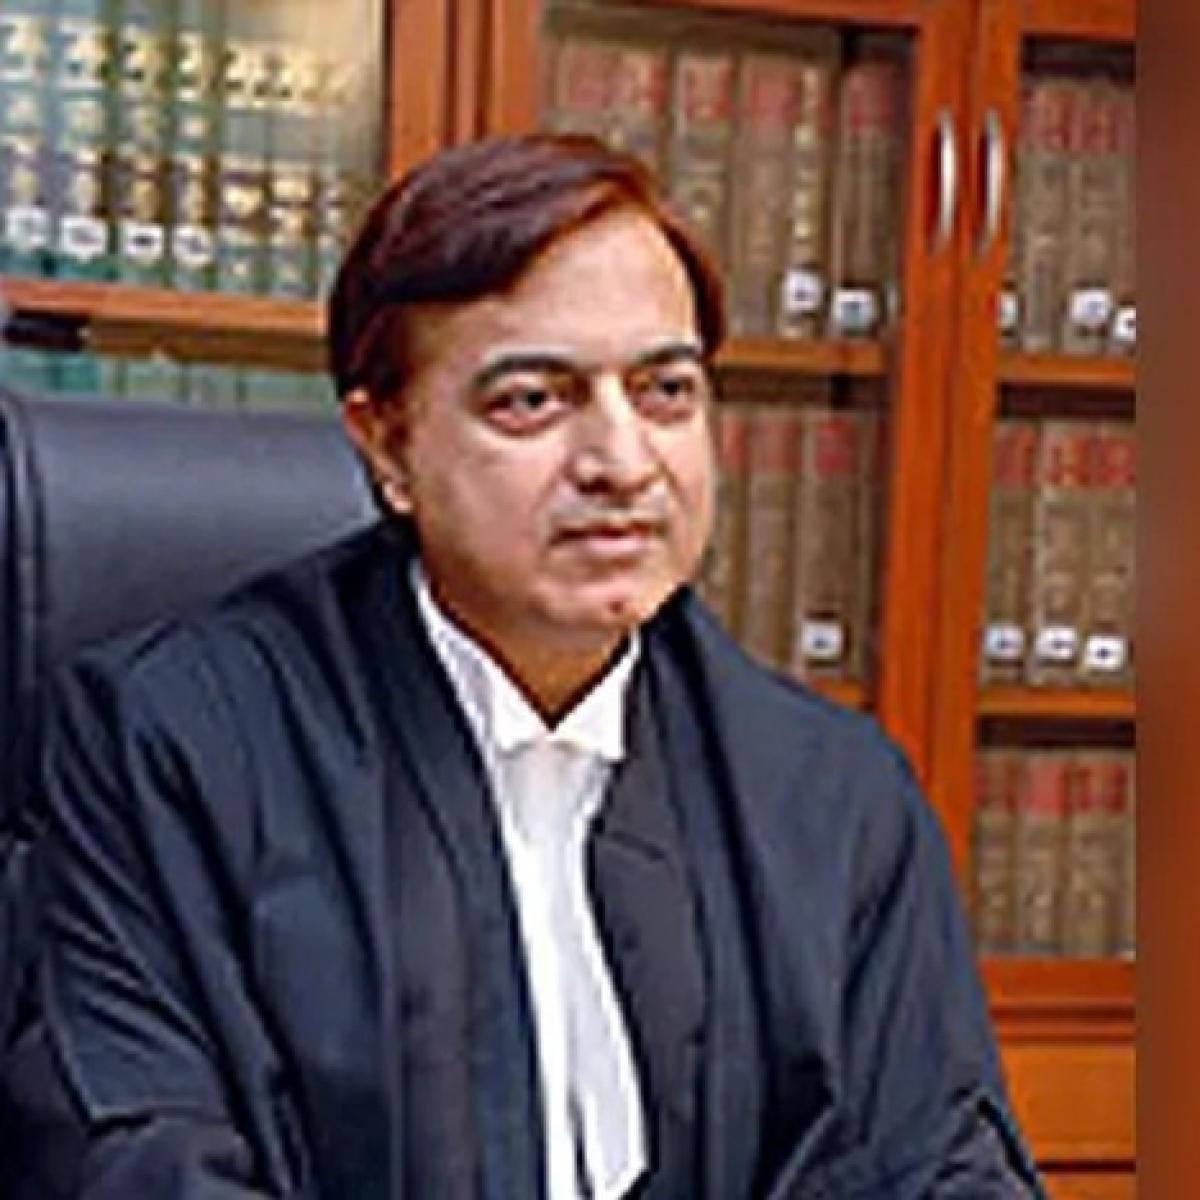 Justice Sunil Gaur, who paved way for Chidambaram's arrest, retires as Delhi HC judge